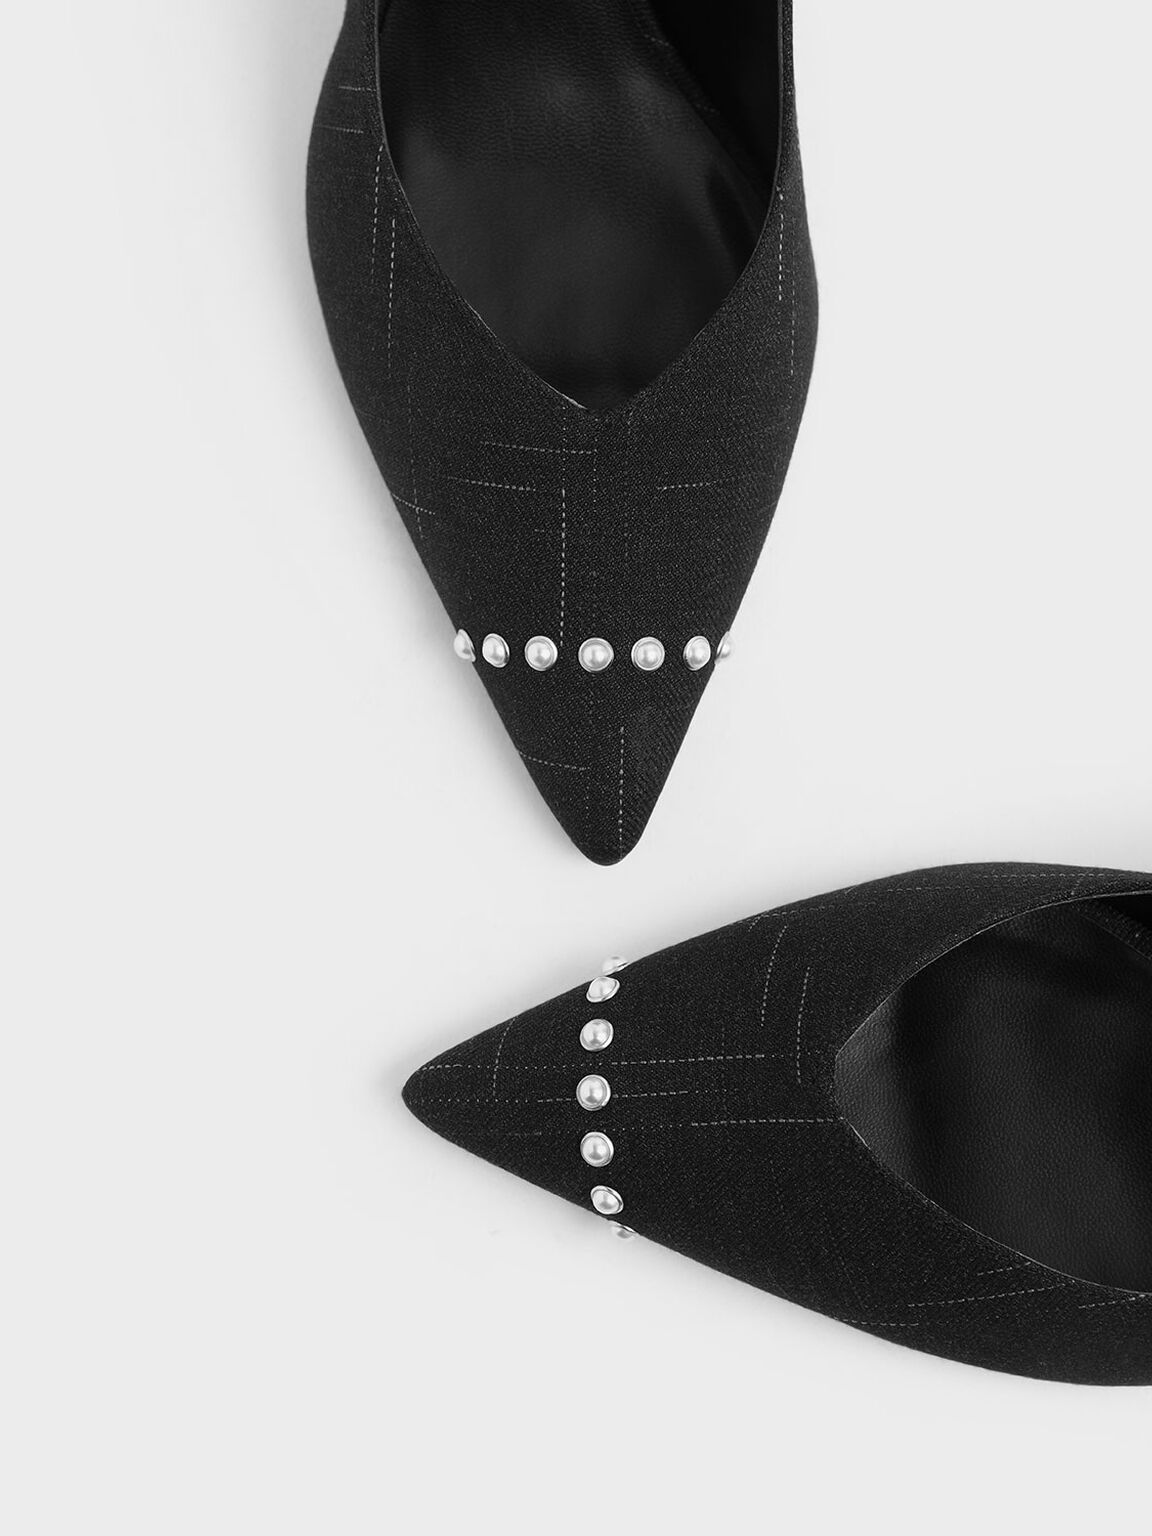 Embellished Trim Pointed Toe Fabric Pumps, Black Textured, hi-res